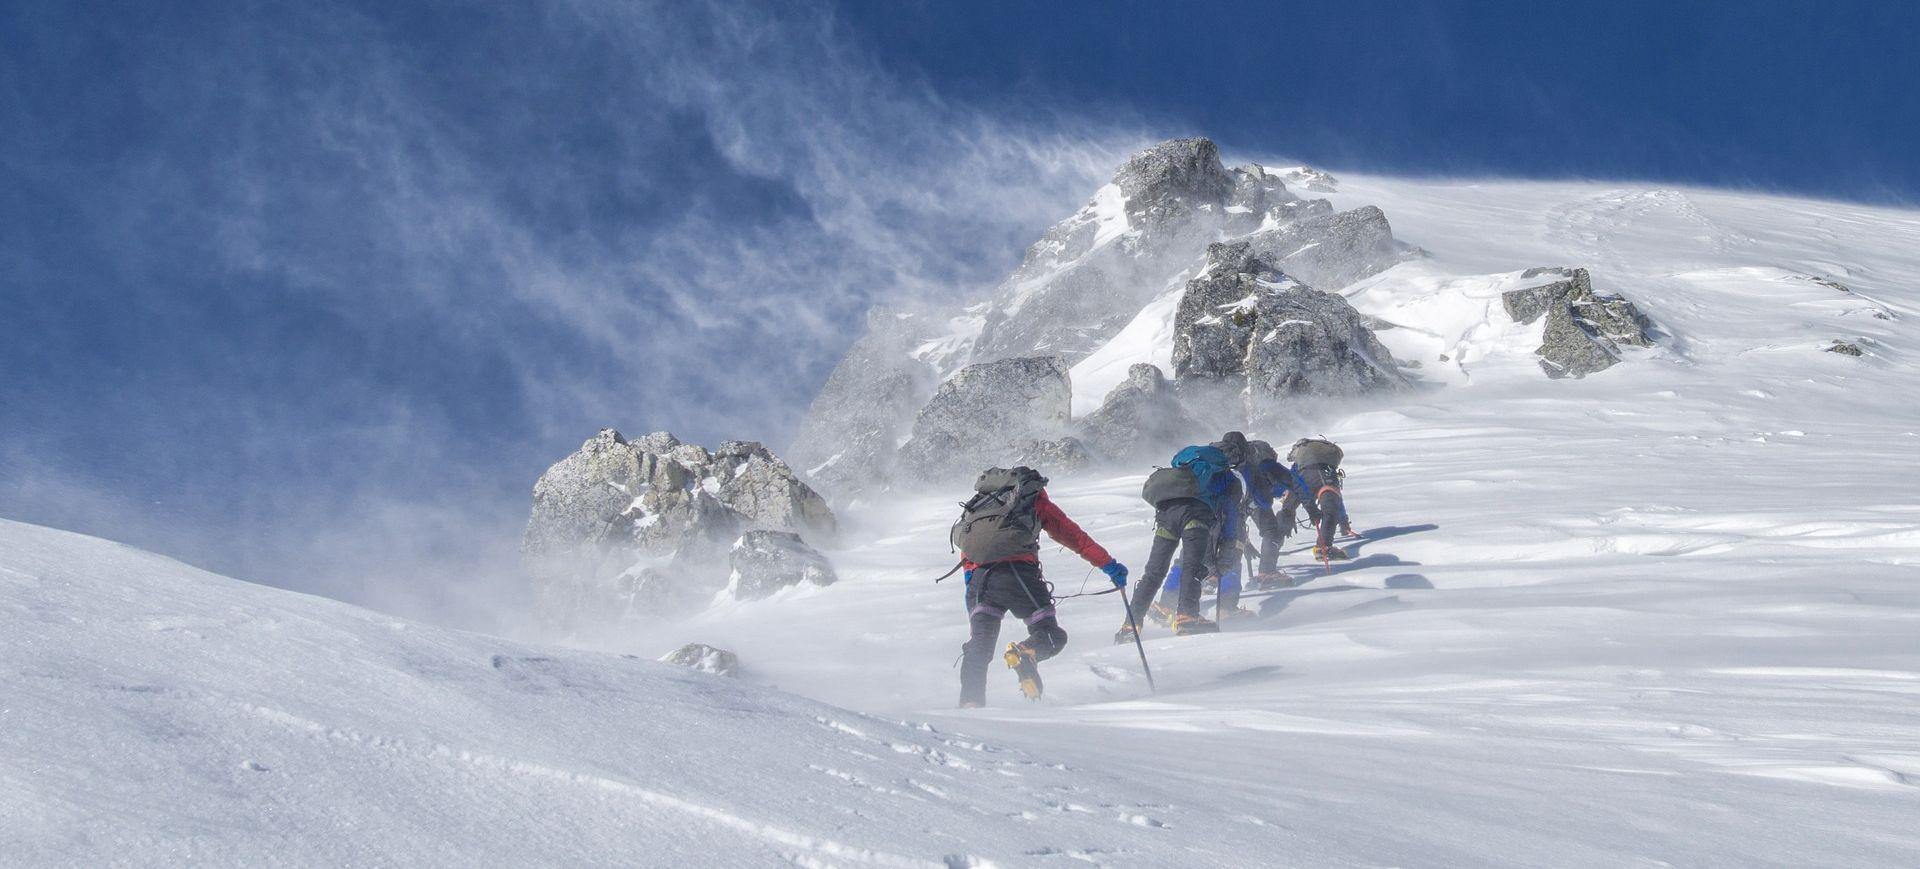 AUSTRIJSKE ALPE Planinar spašen nakon pet dana